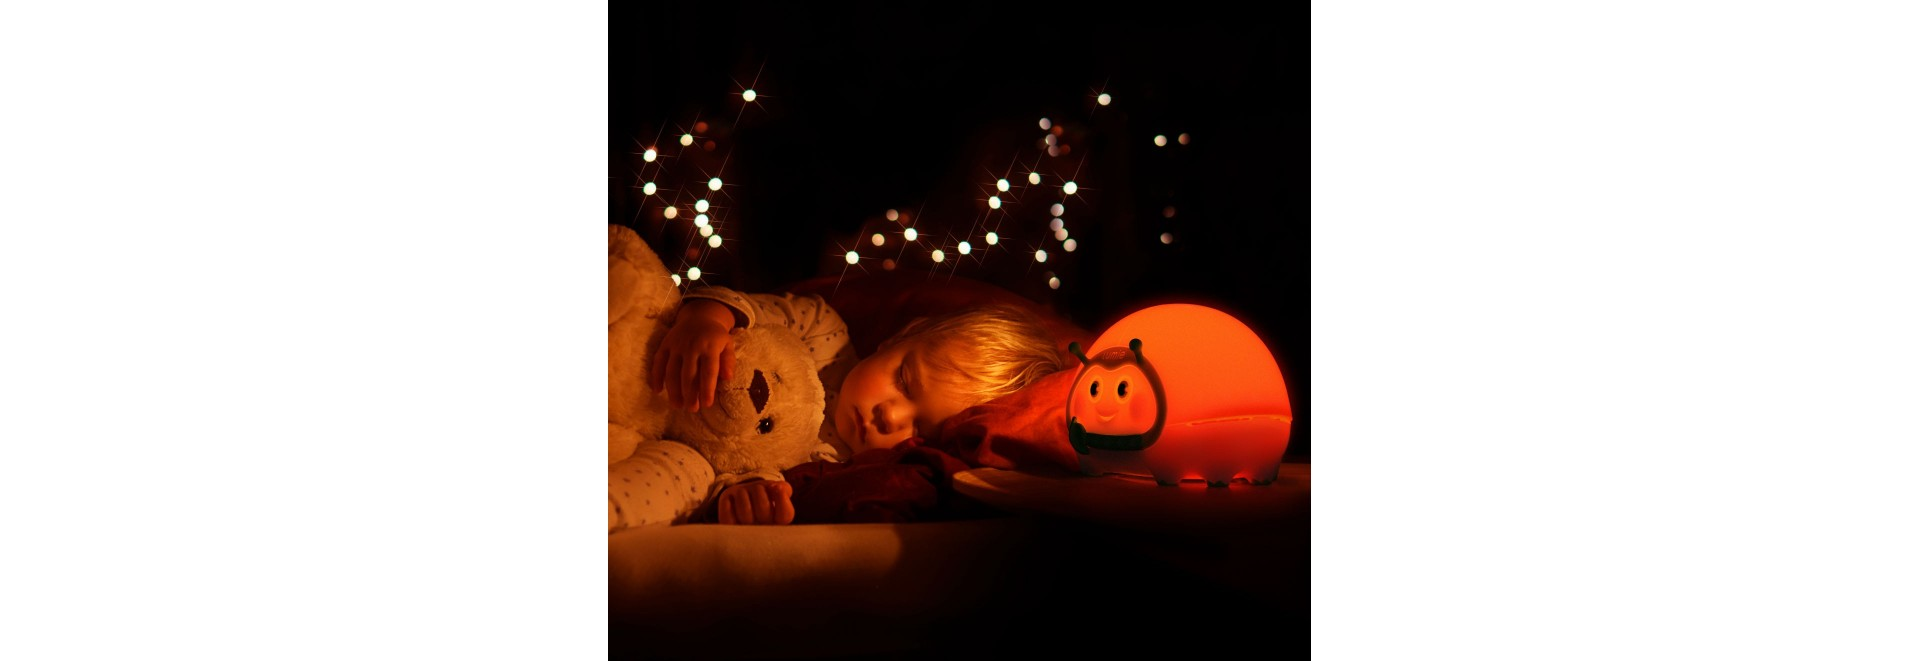 Aides à l'endormissement - Medi-Lum